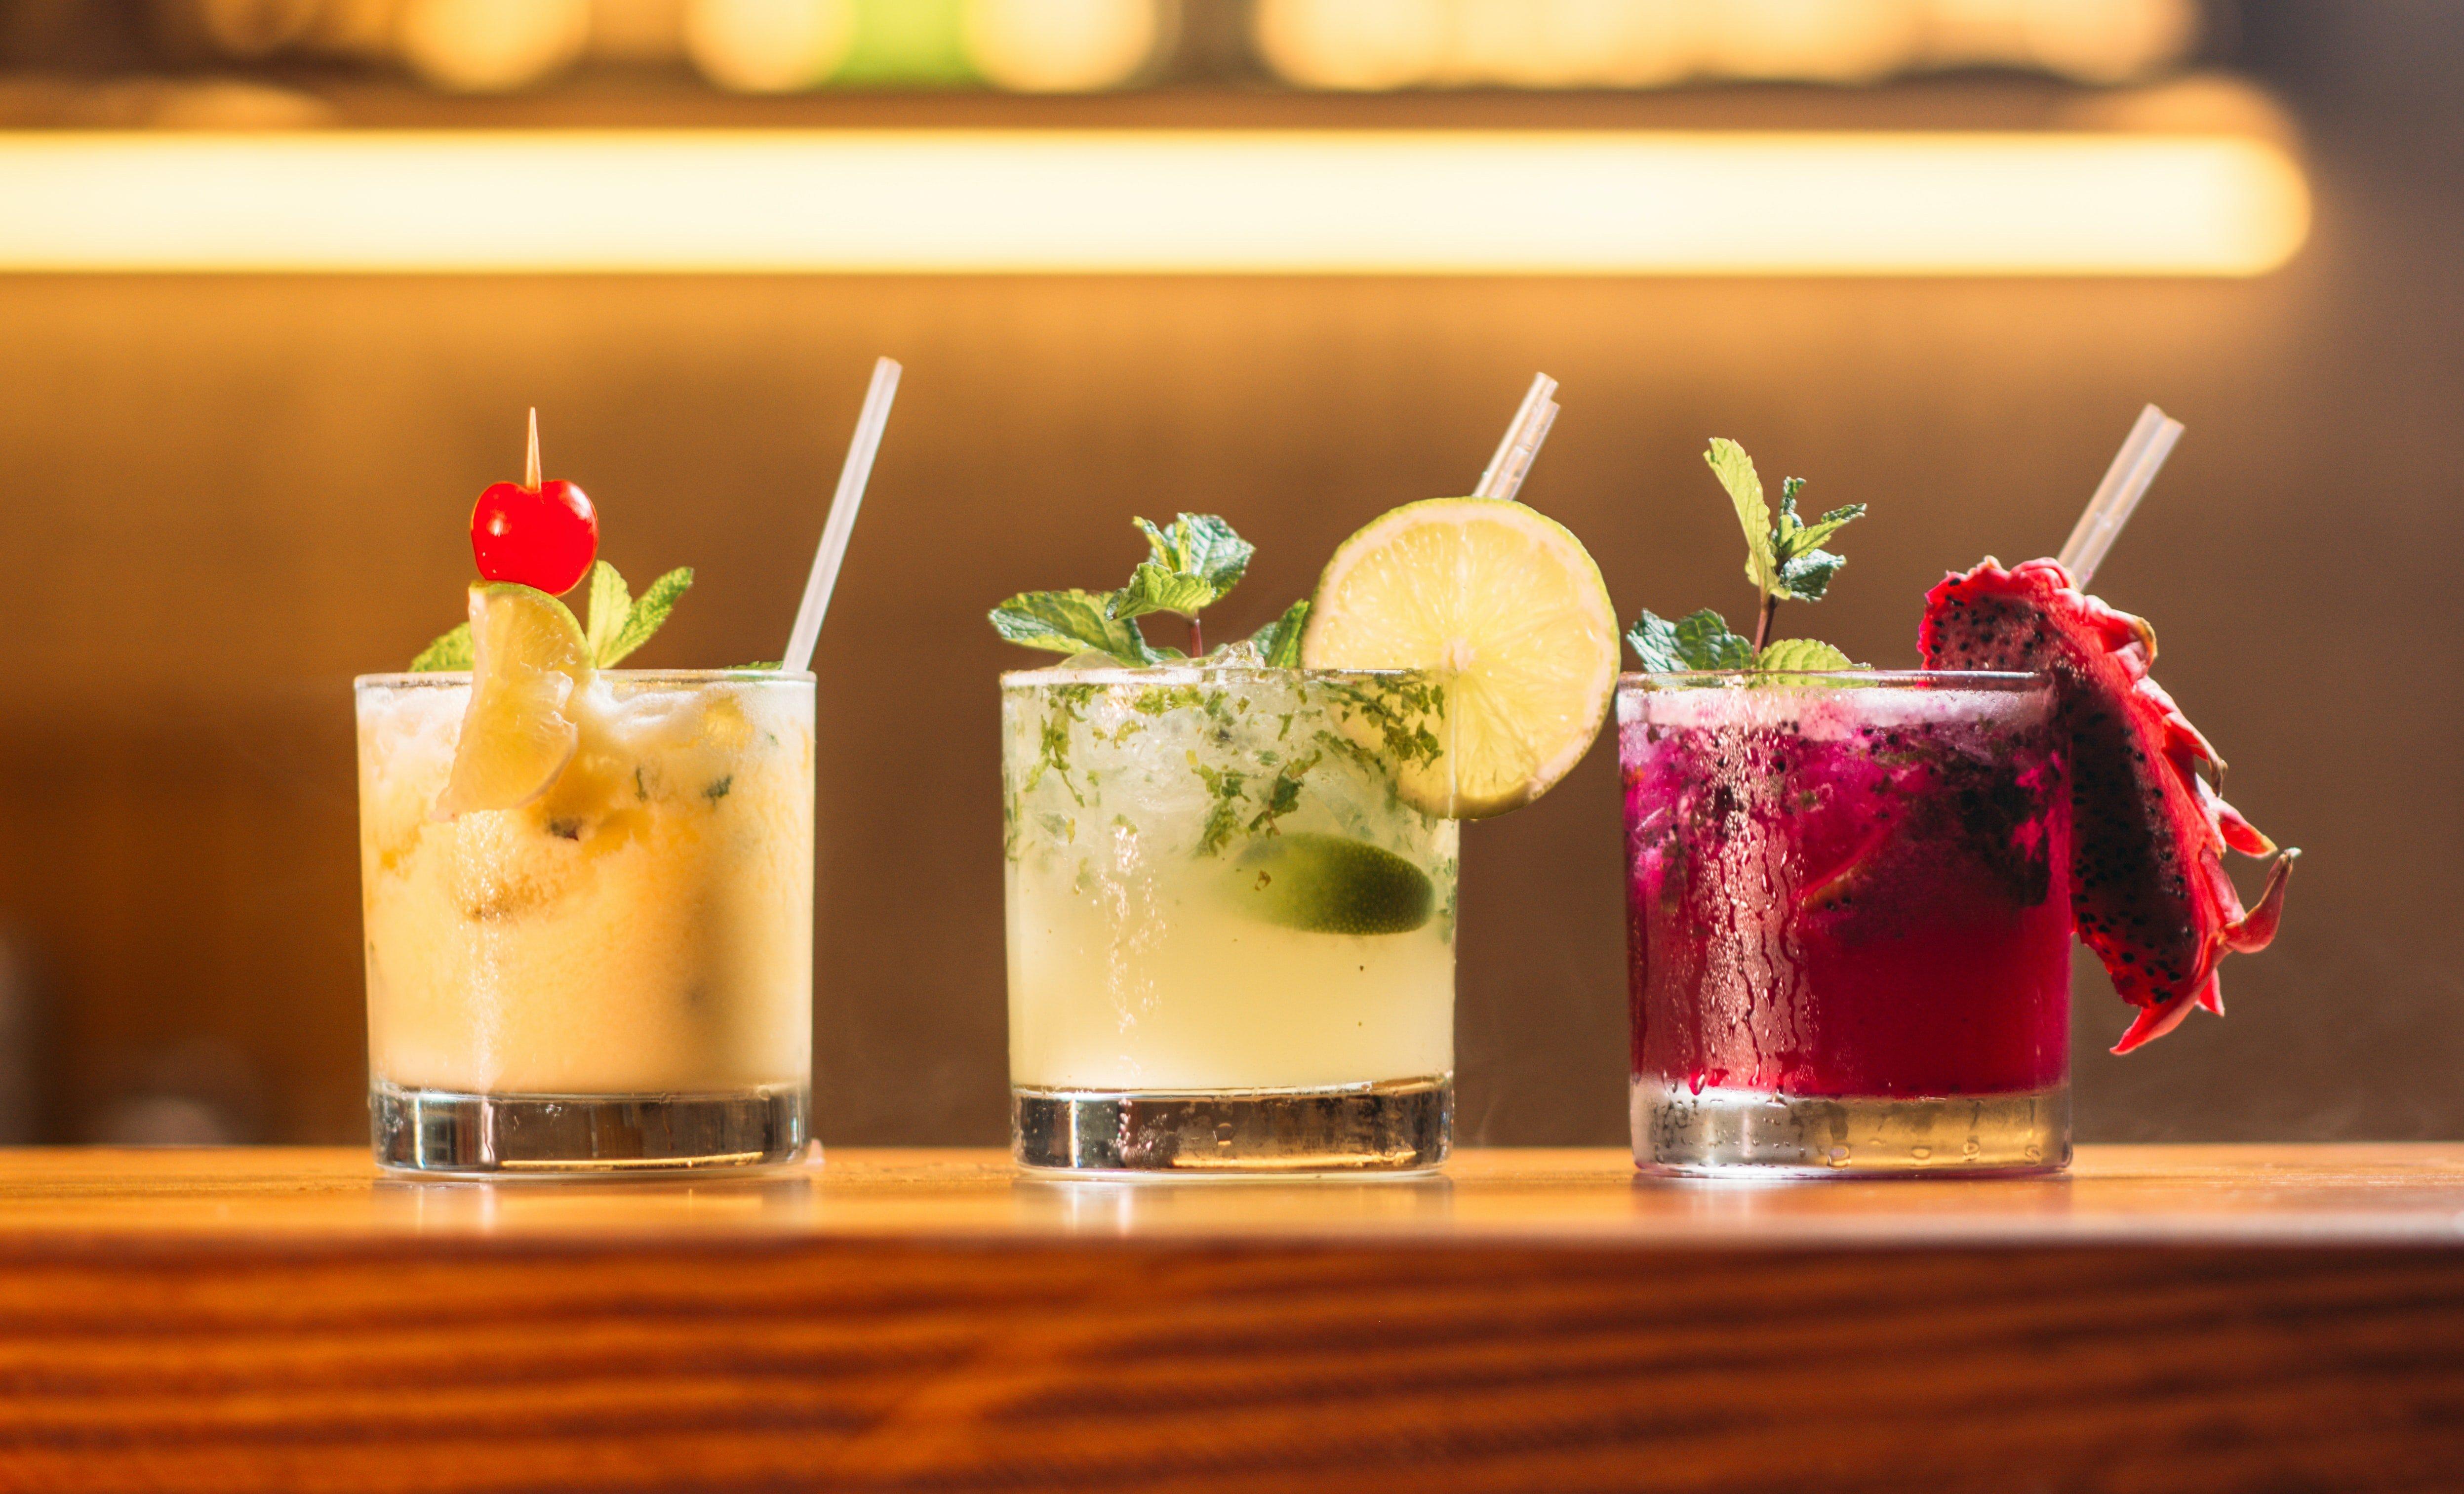 tasting different cocktails